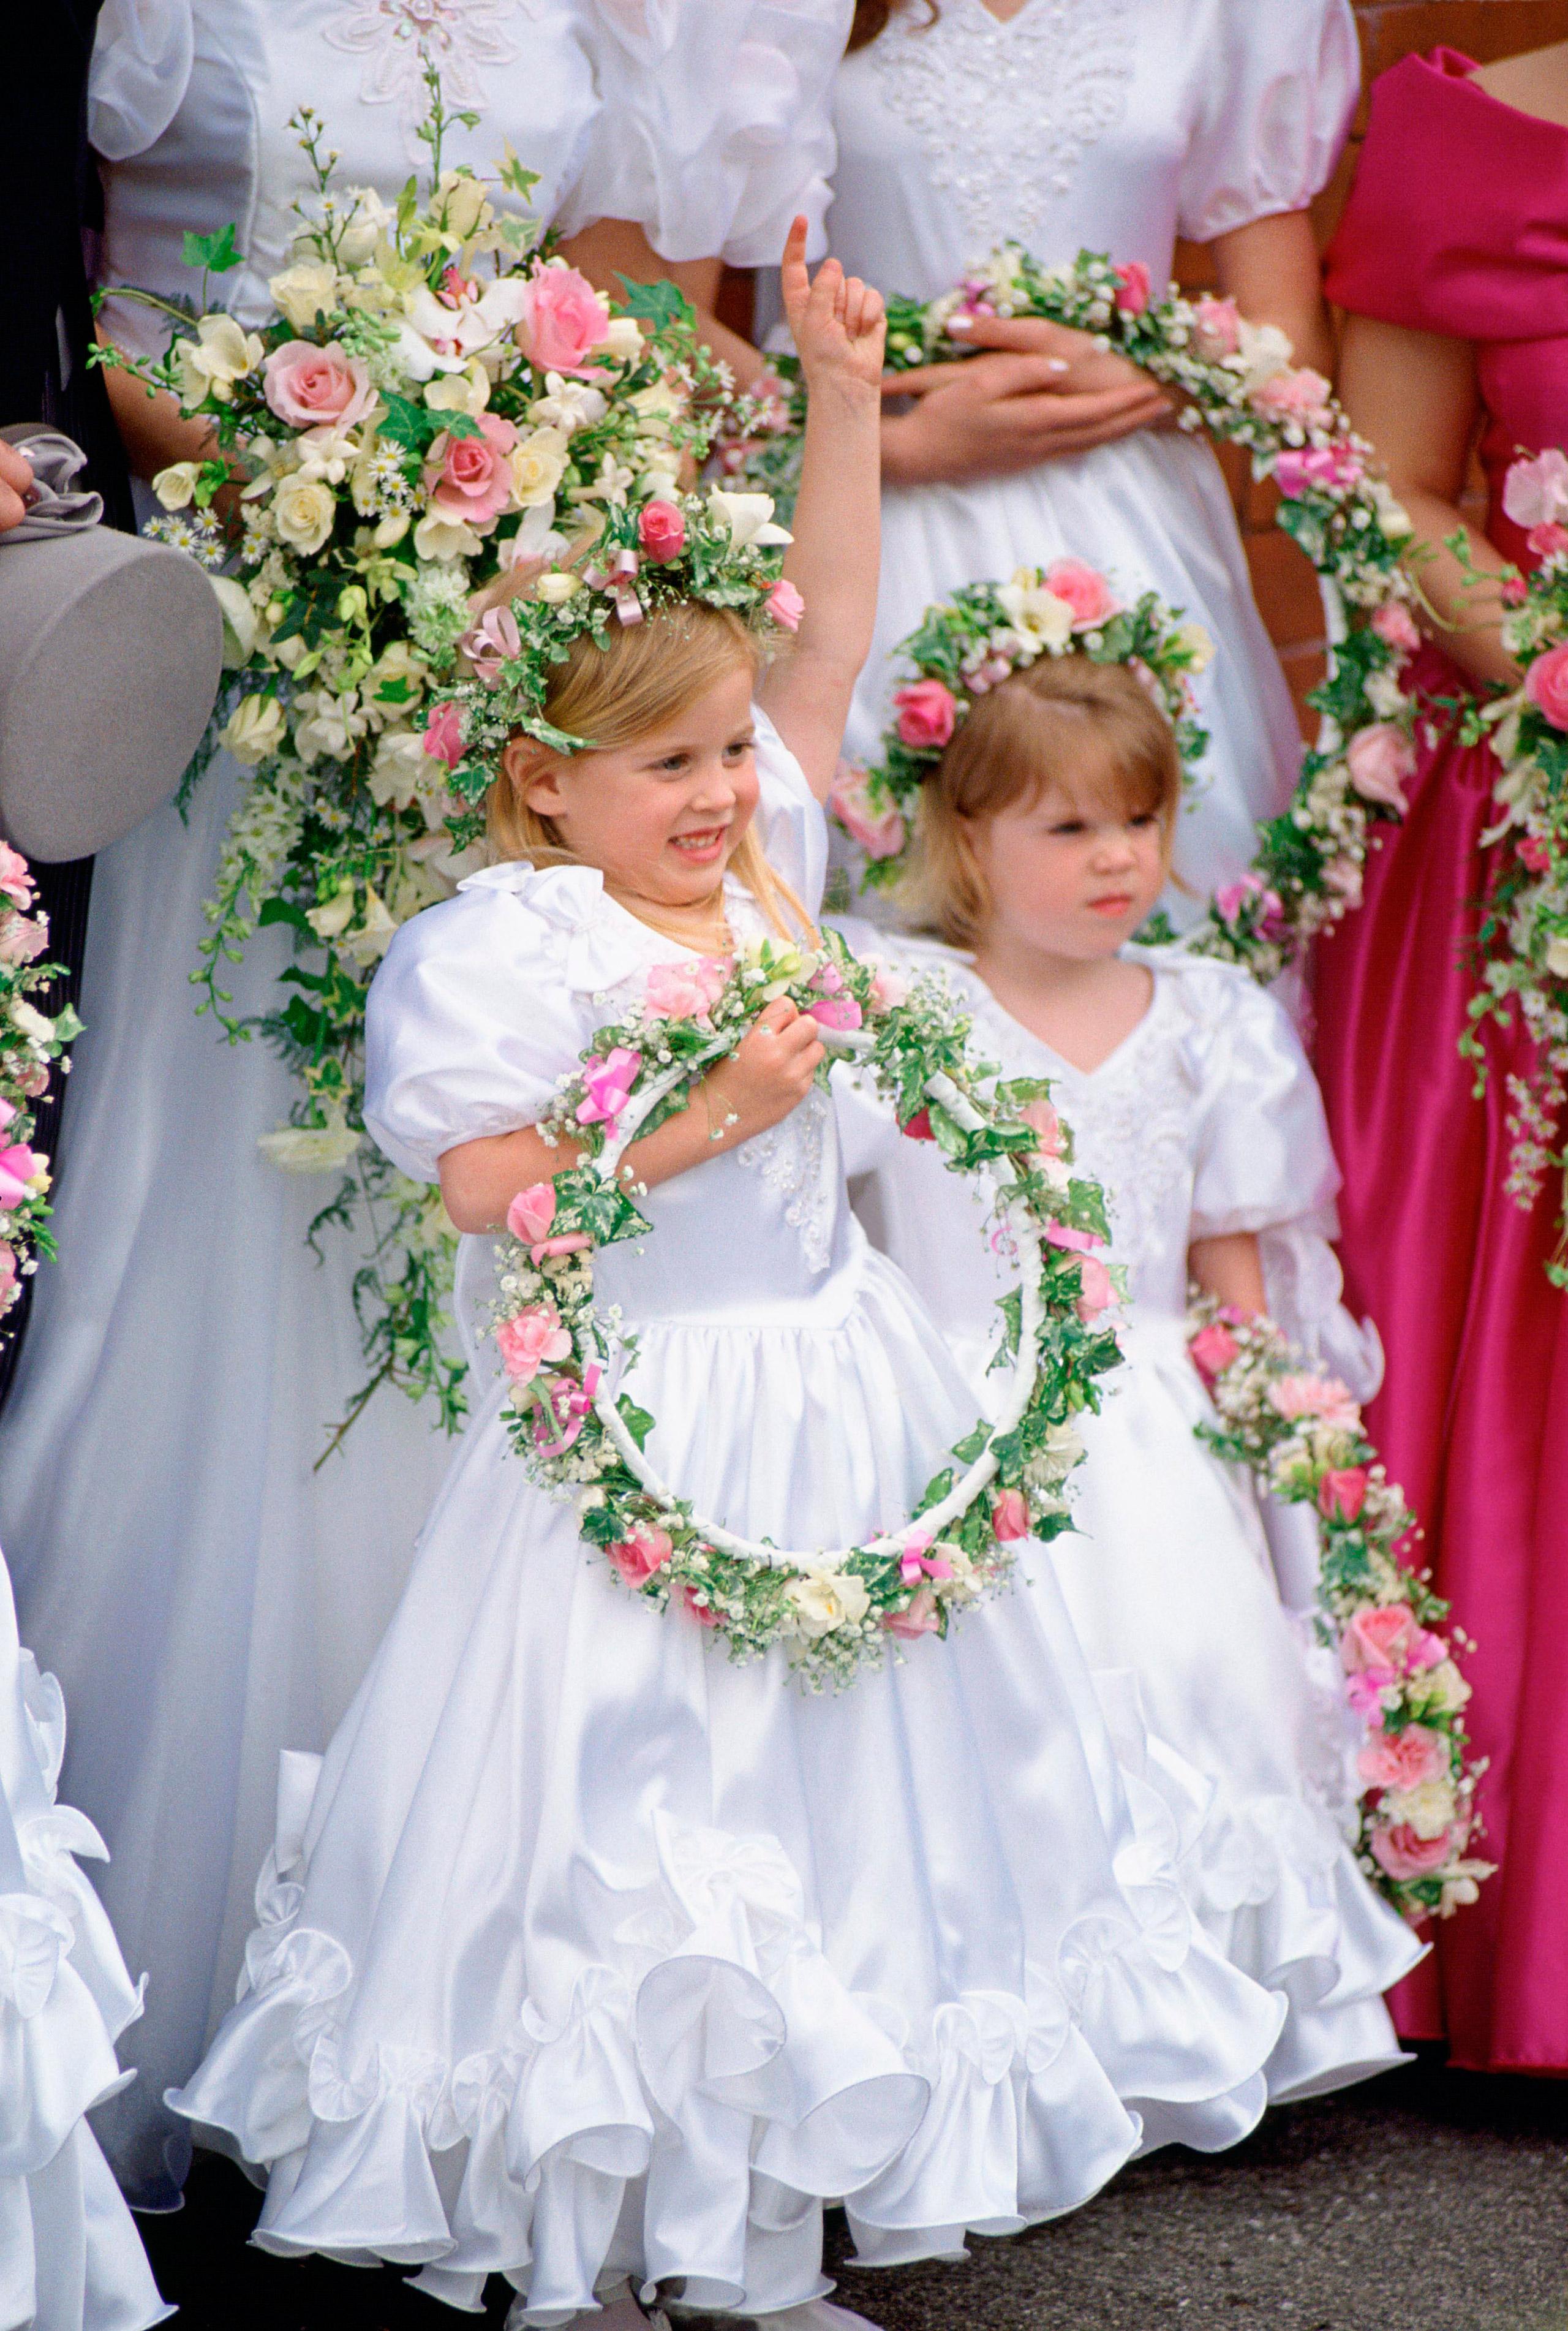 Princess Beatrice and Princess Eugenie as bridesmaids at Alison Wardley wedding. 1993.